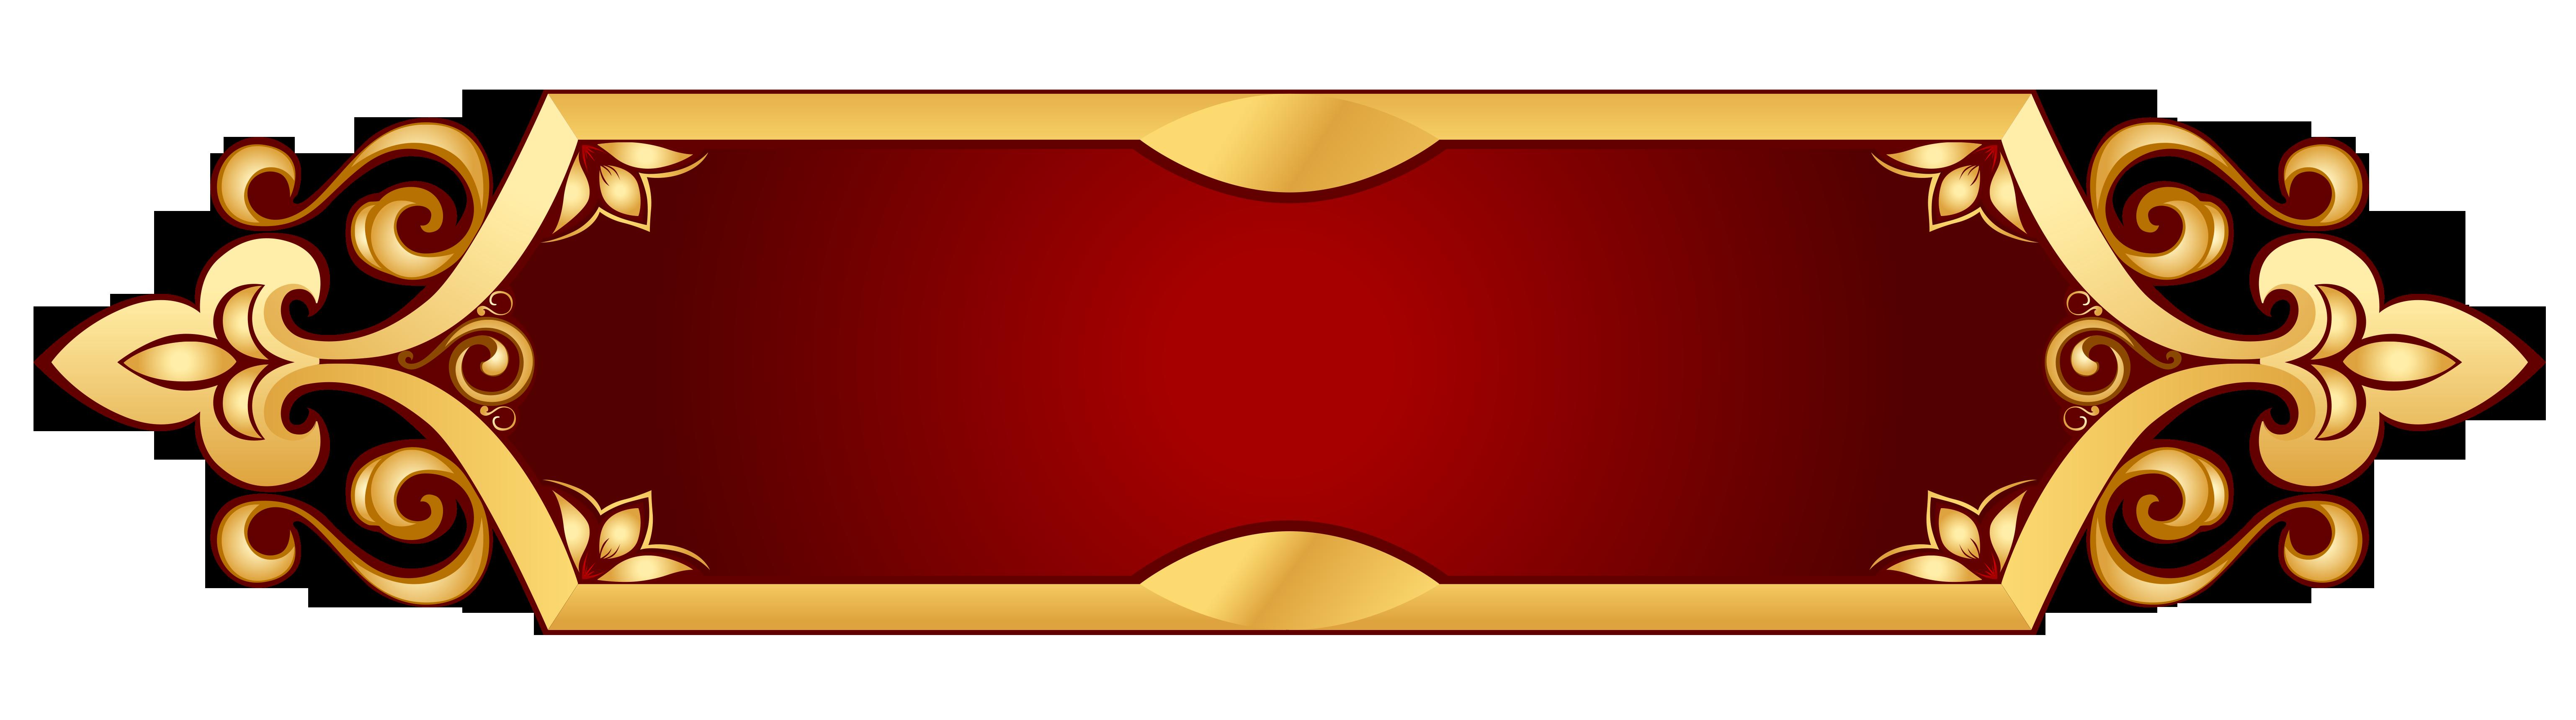 Decorative Banner Transparent Png Picture Banner Background Images Banner Clip Art Frames Borders